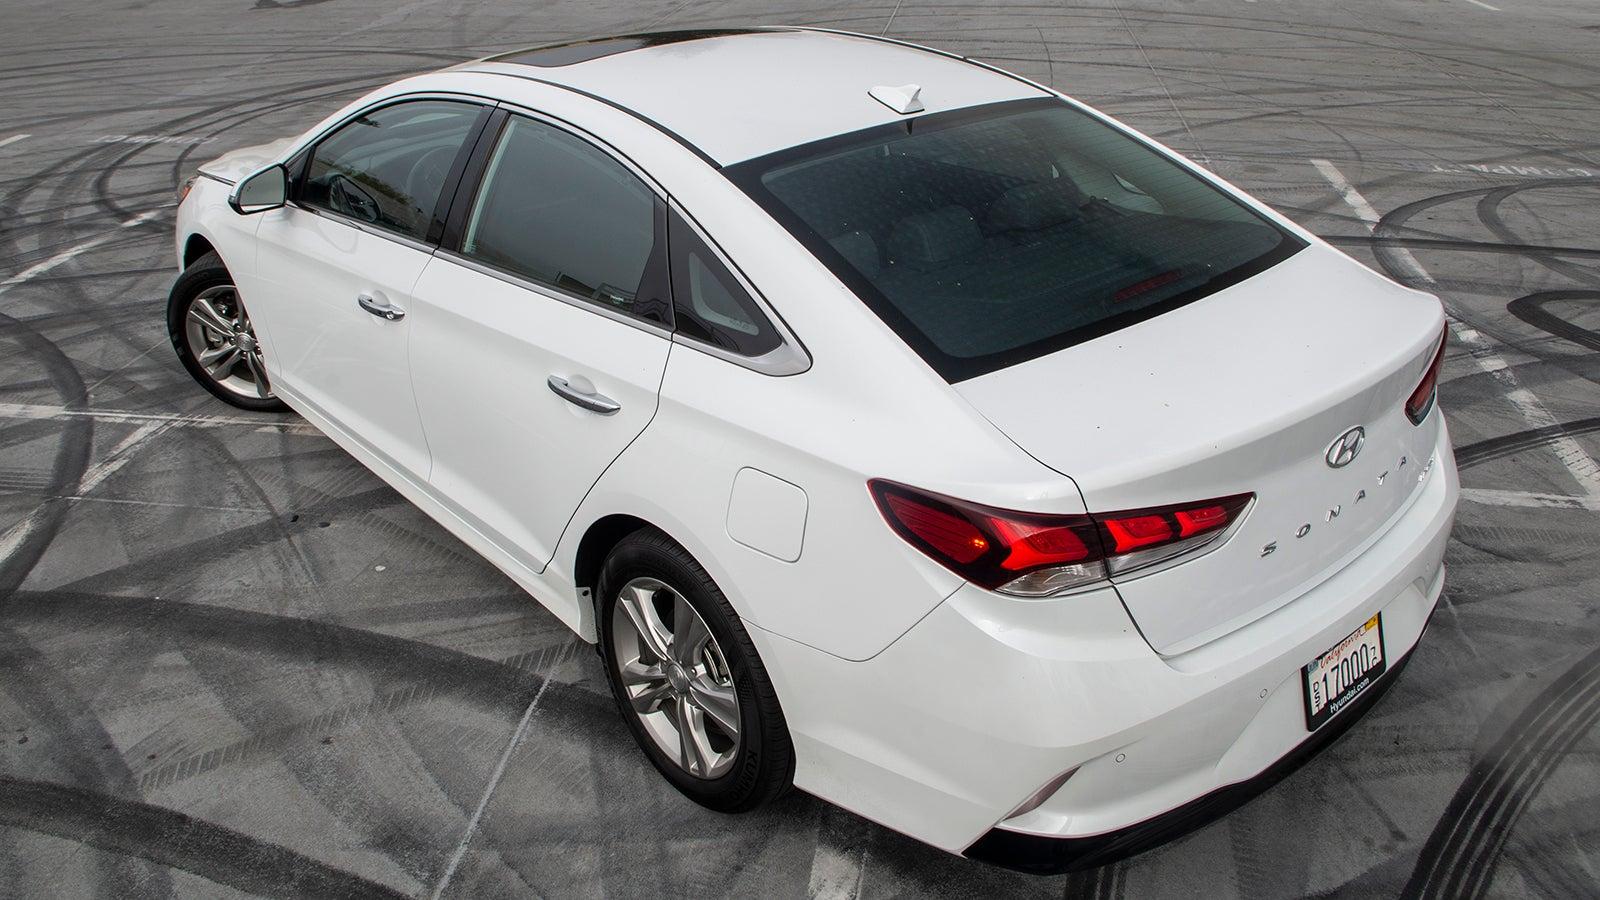 The 2018 Hyundai Sonata Is The Most User Friendly Car I've